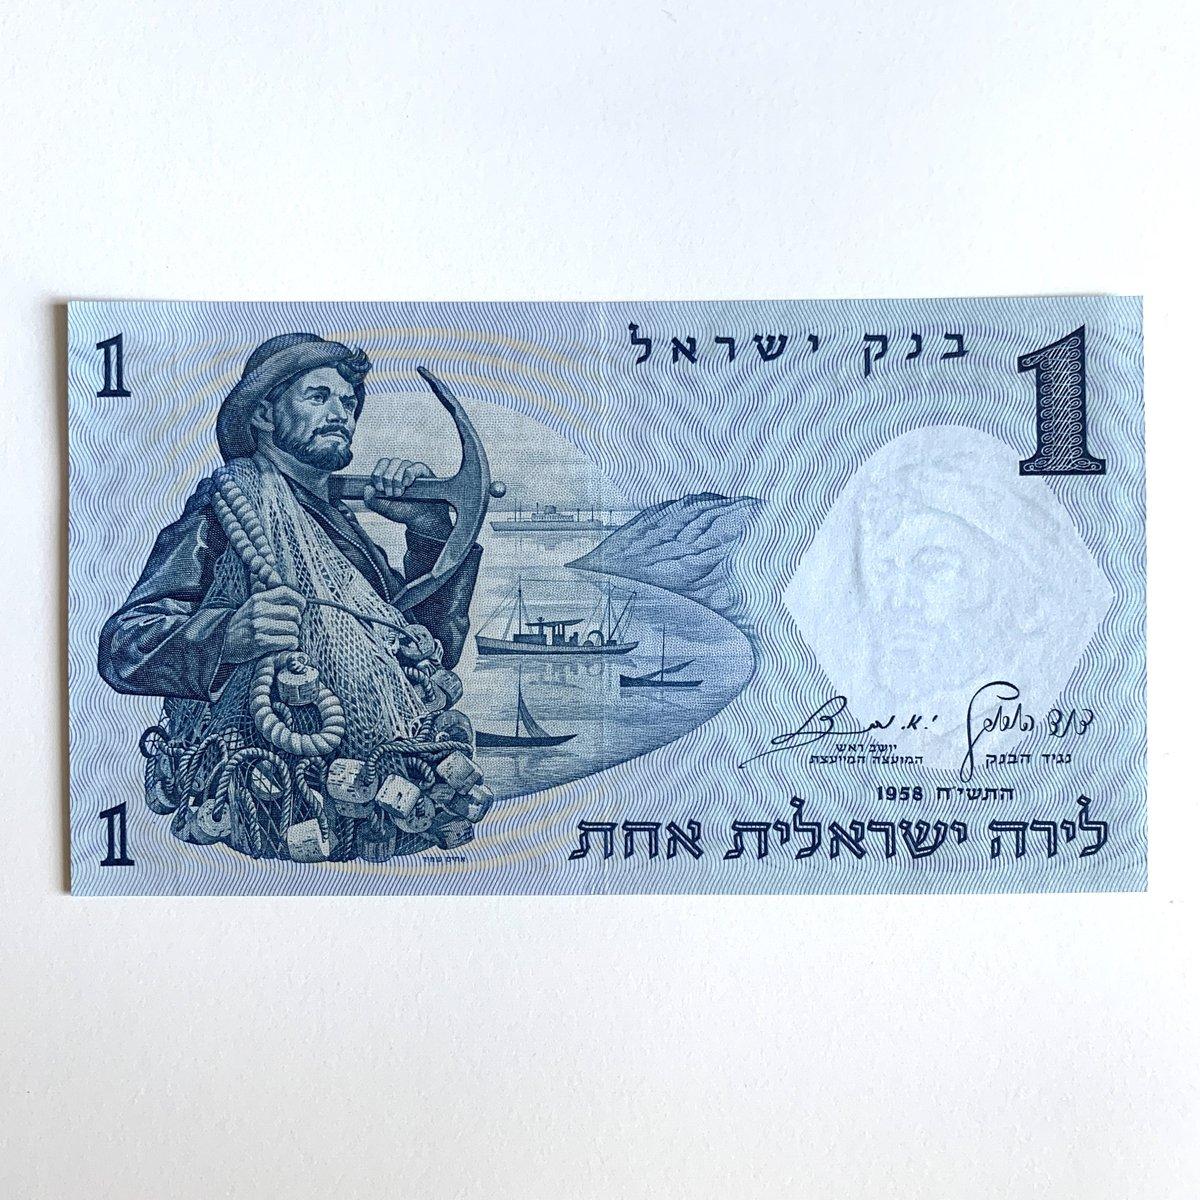 my #etsy shop: 1958 Israeli Lira Banknote. 60 years old currency. Fisherman with net and anchor at front, back Synagogue Mosaic. Israel Notes, Bills.  #currency #bills #pesos #dollars #vintage #antiques #synagogue #mosaic #israeli